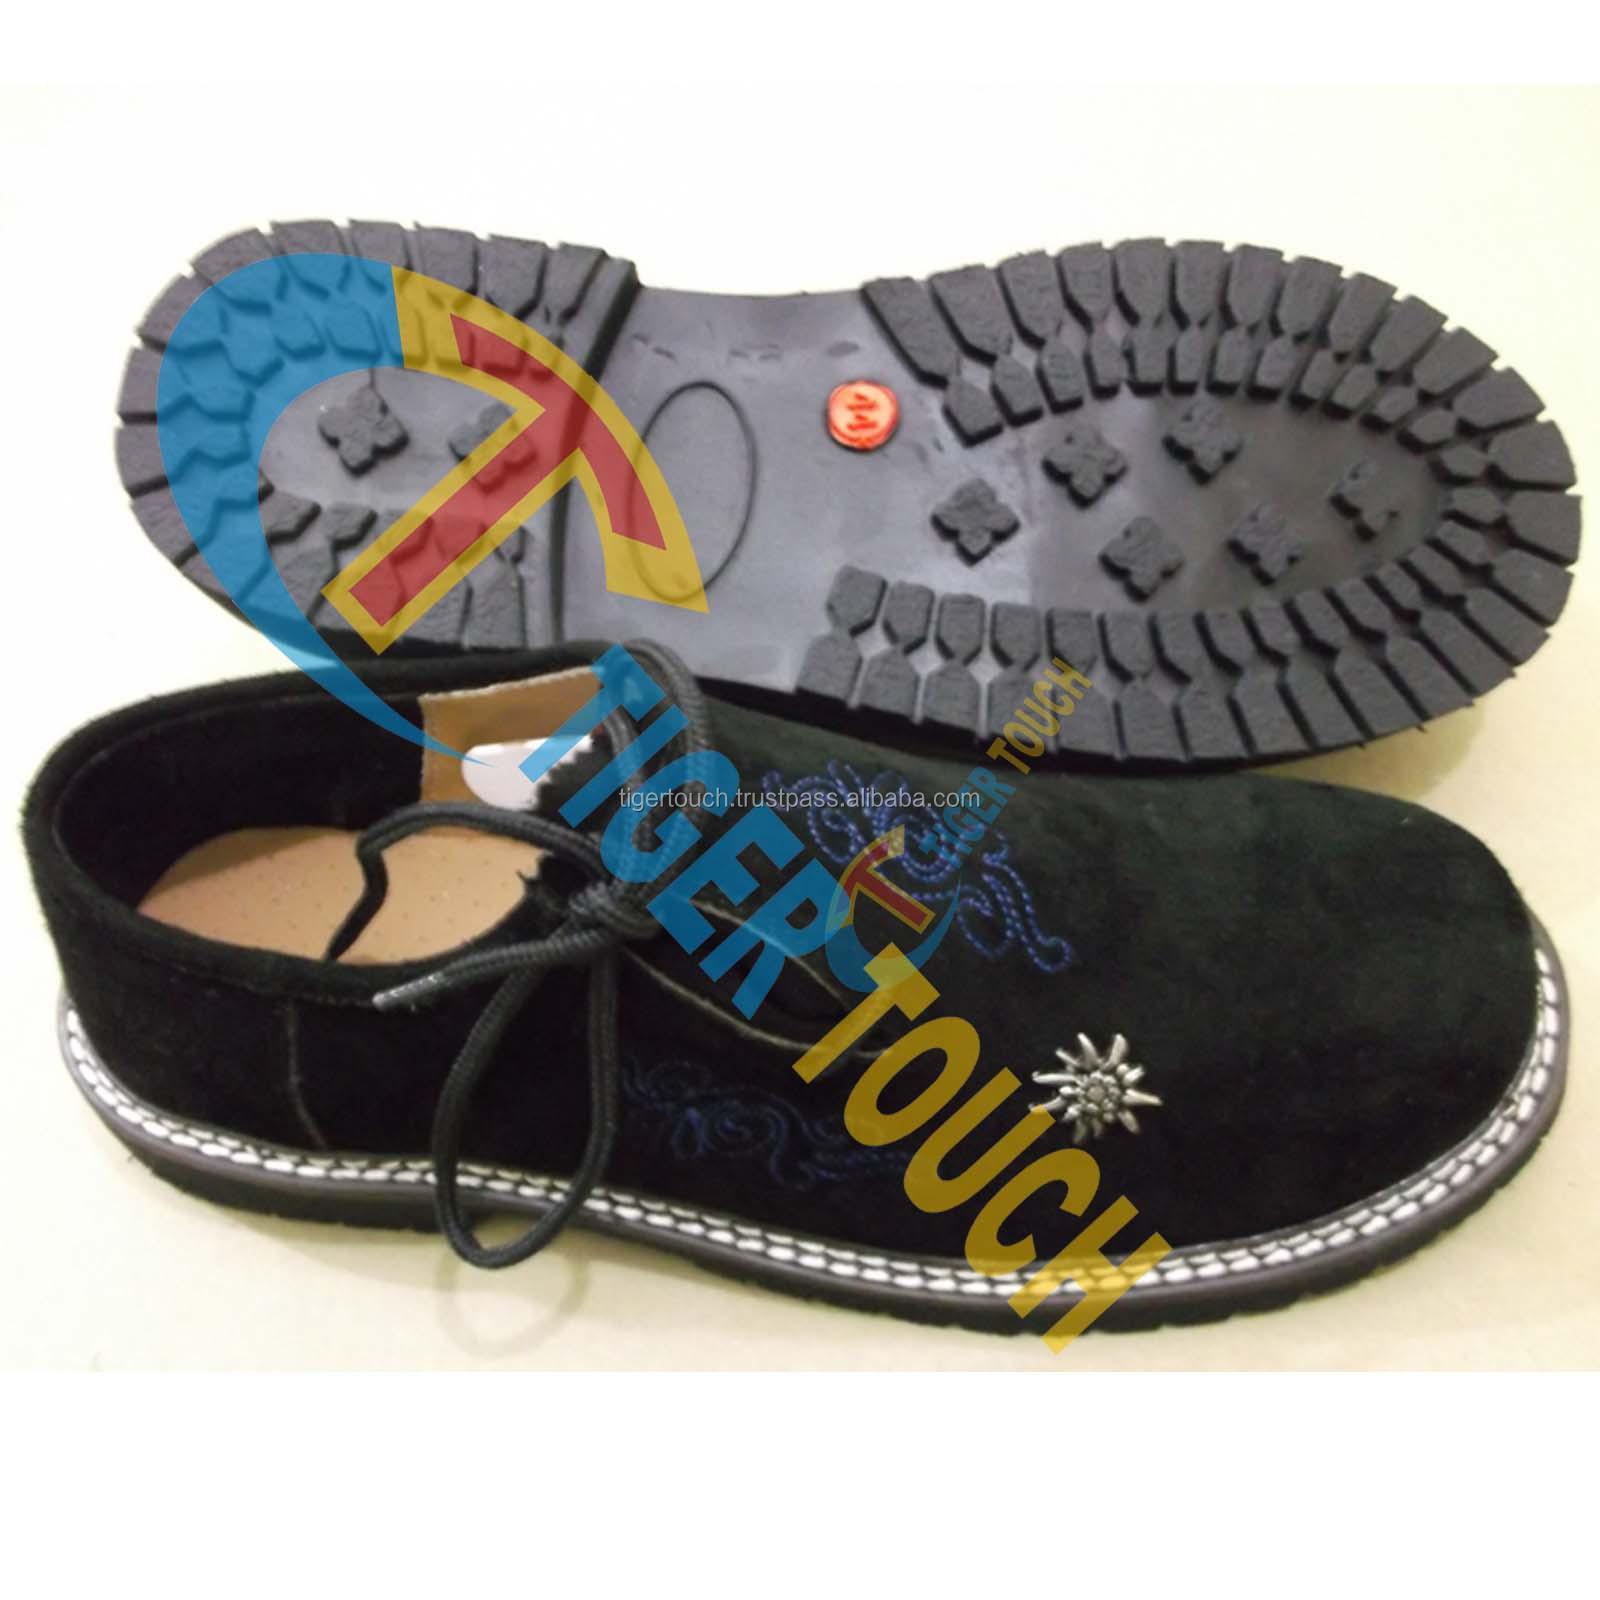 Bayerischen Schuhe Mann Leder Schuhe Trachten Traditionellen Herren Schuhe Buy Bayerischen Schuhe Mann Leder Schuhe Trachten Traditionellen Herren